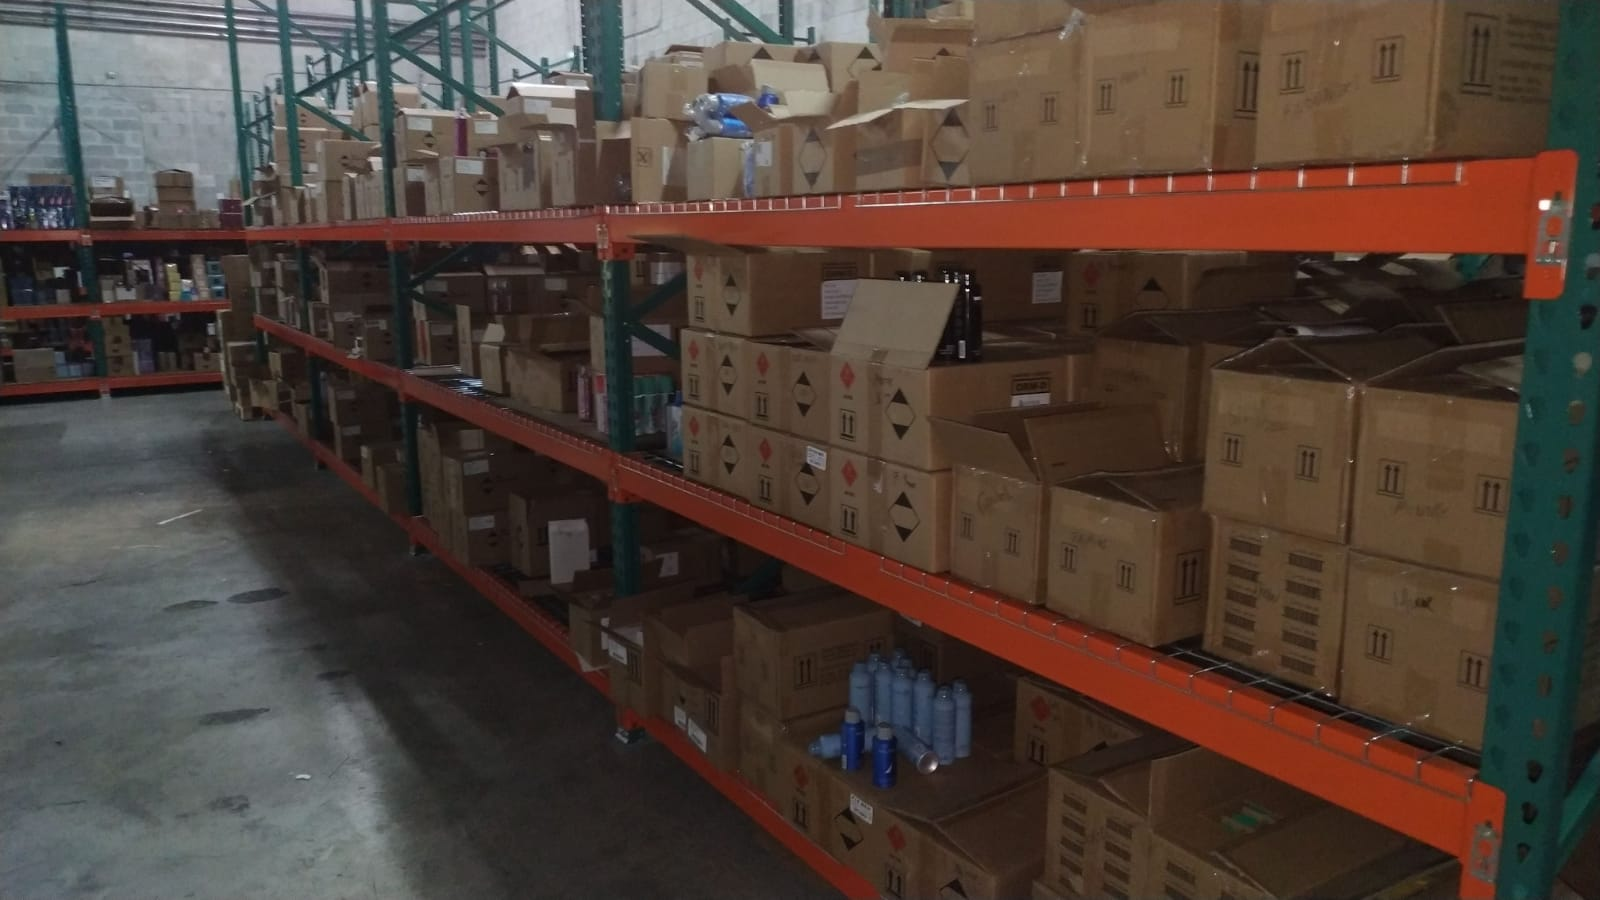 warehouse-image-8.jpg